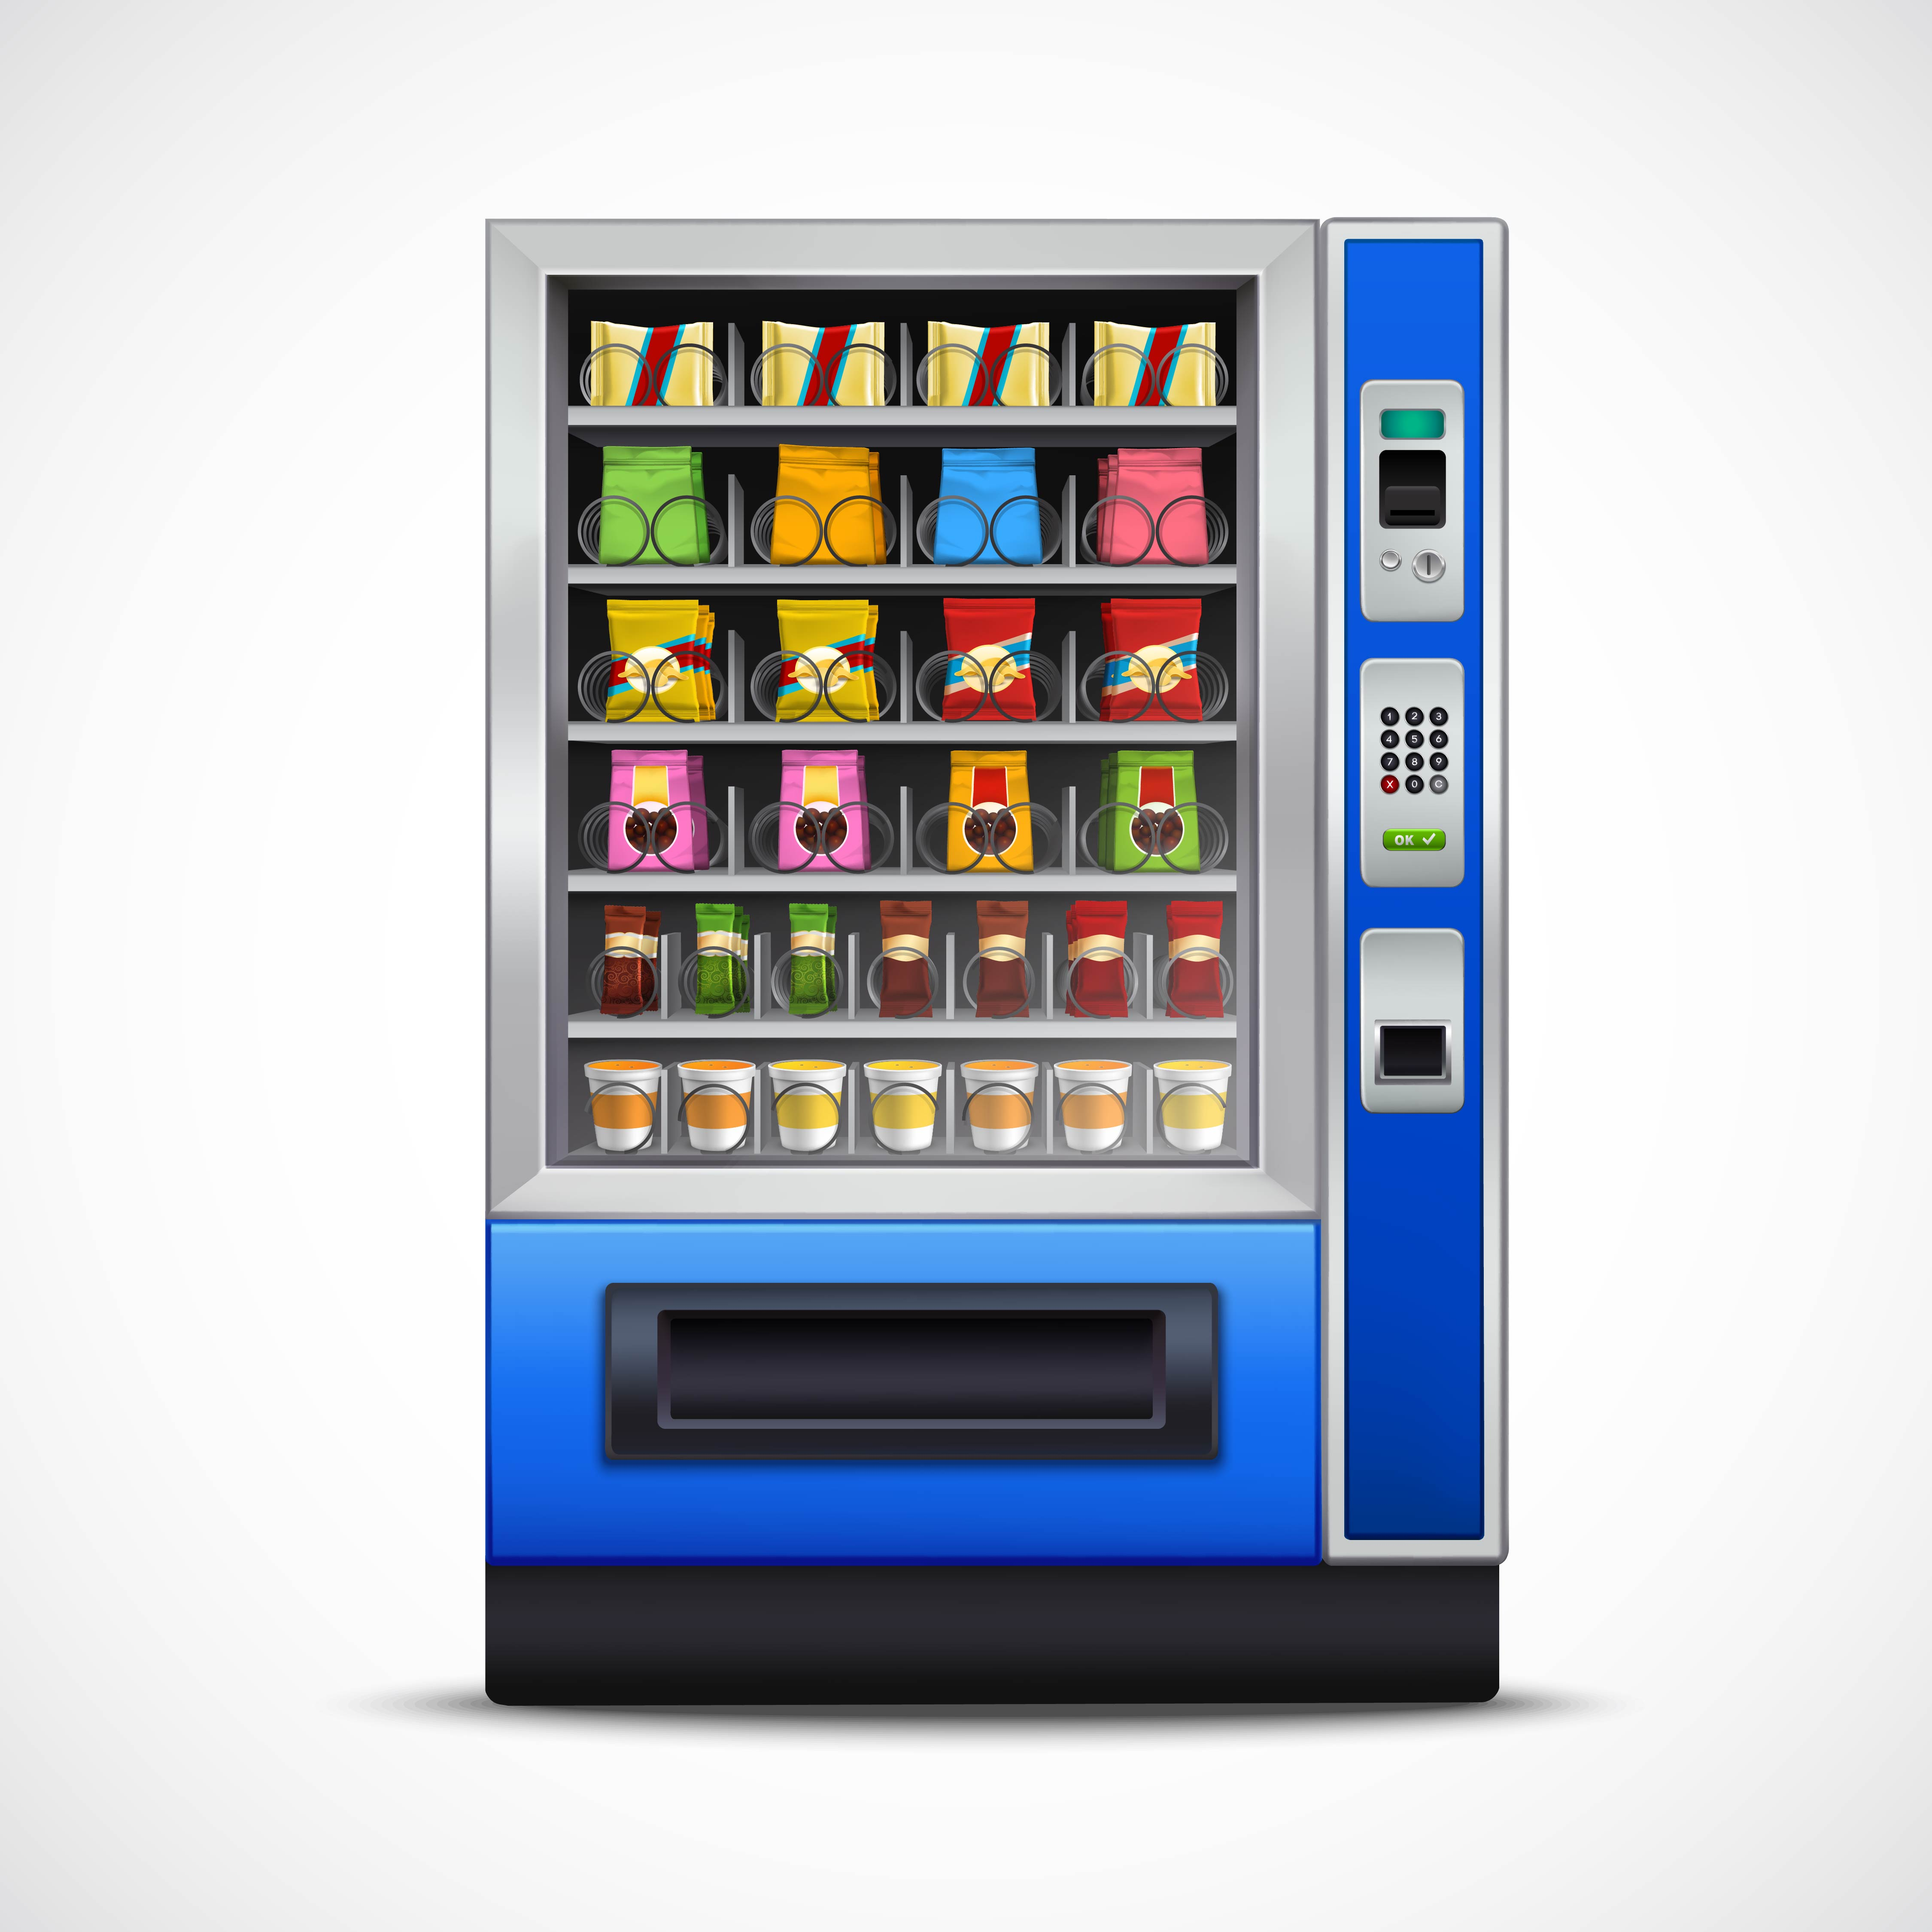 Realistic Snacks Vending Machine - Download Free Vectors, Clipart Graphics & Vector Art